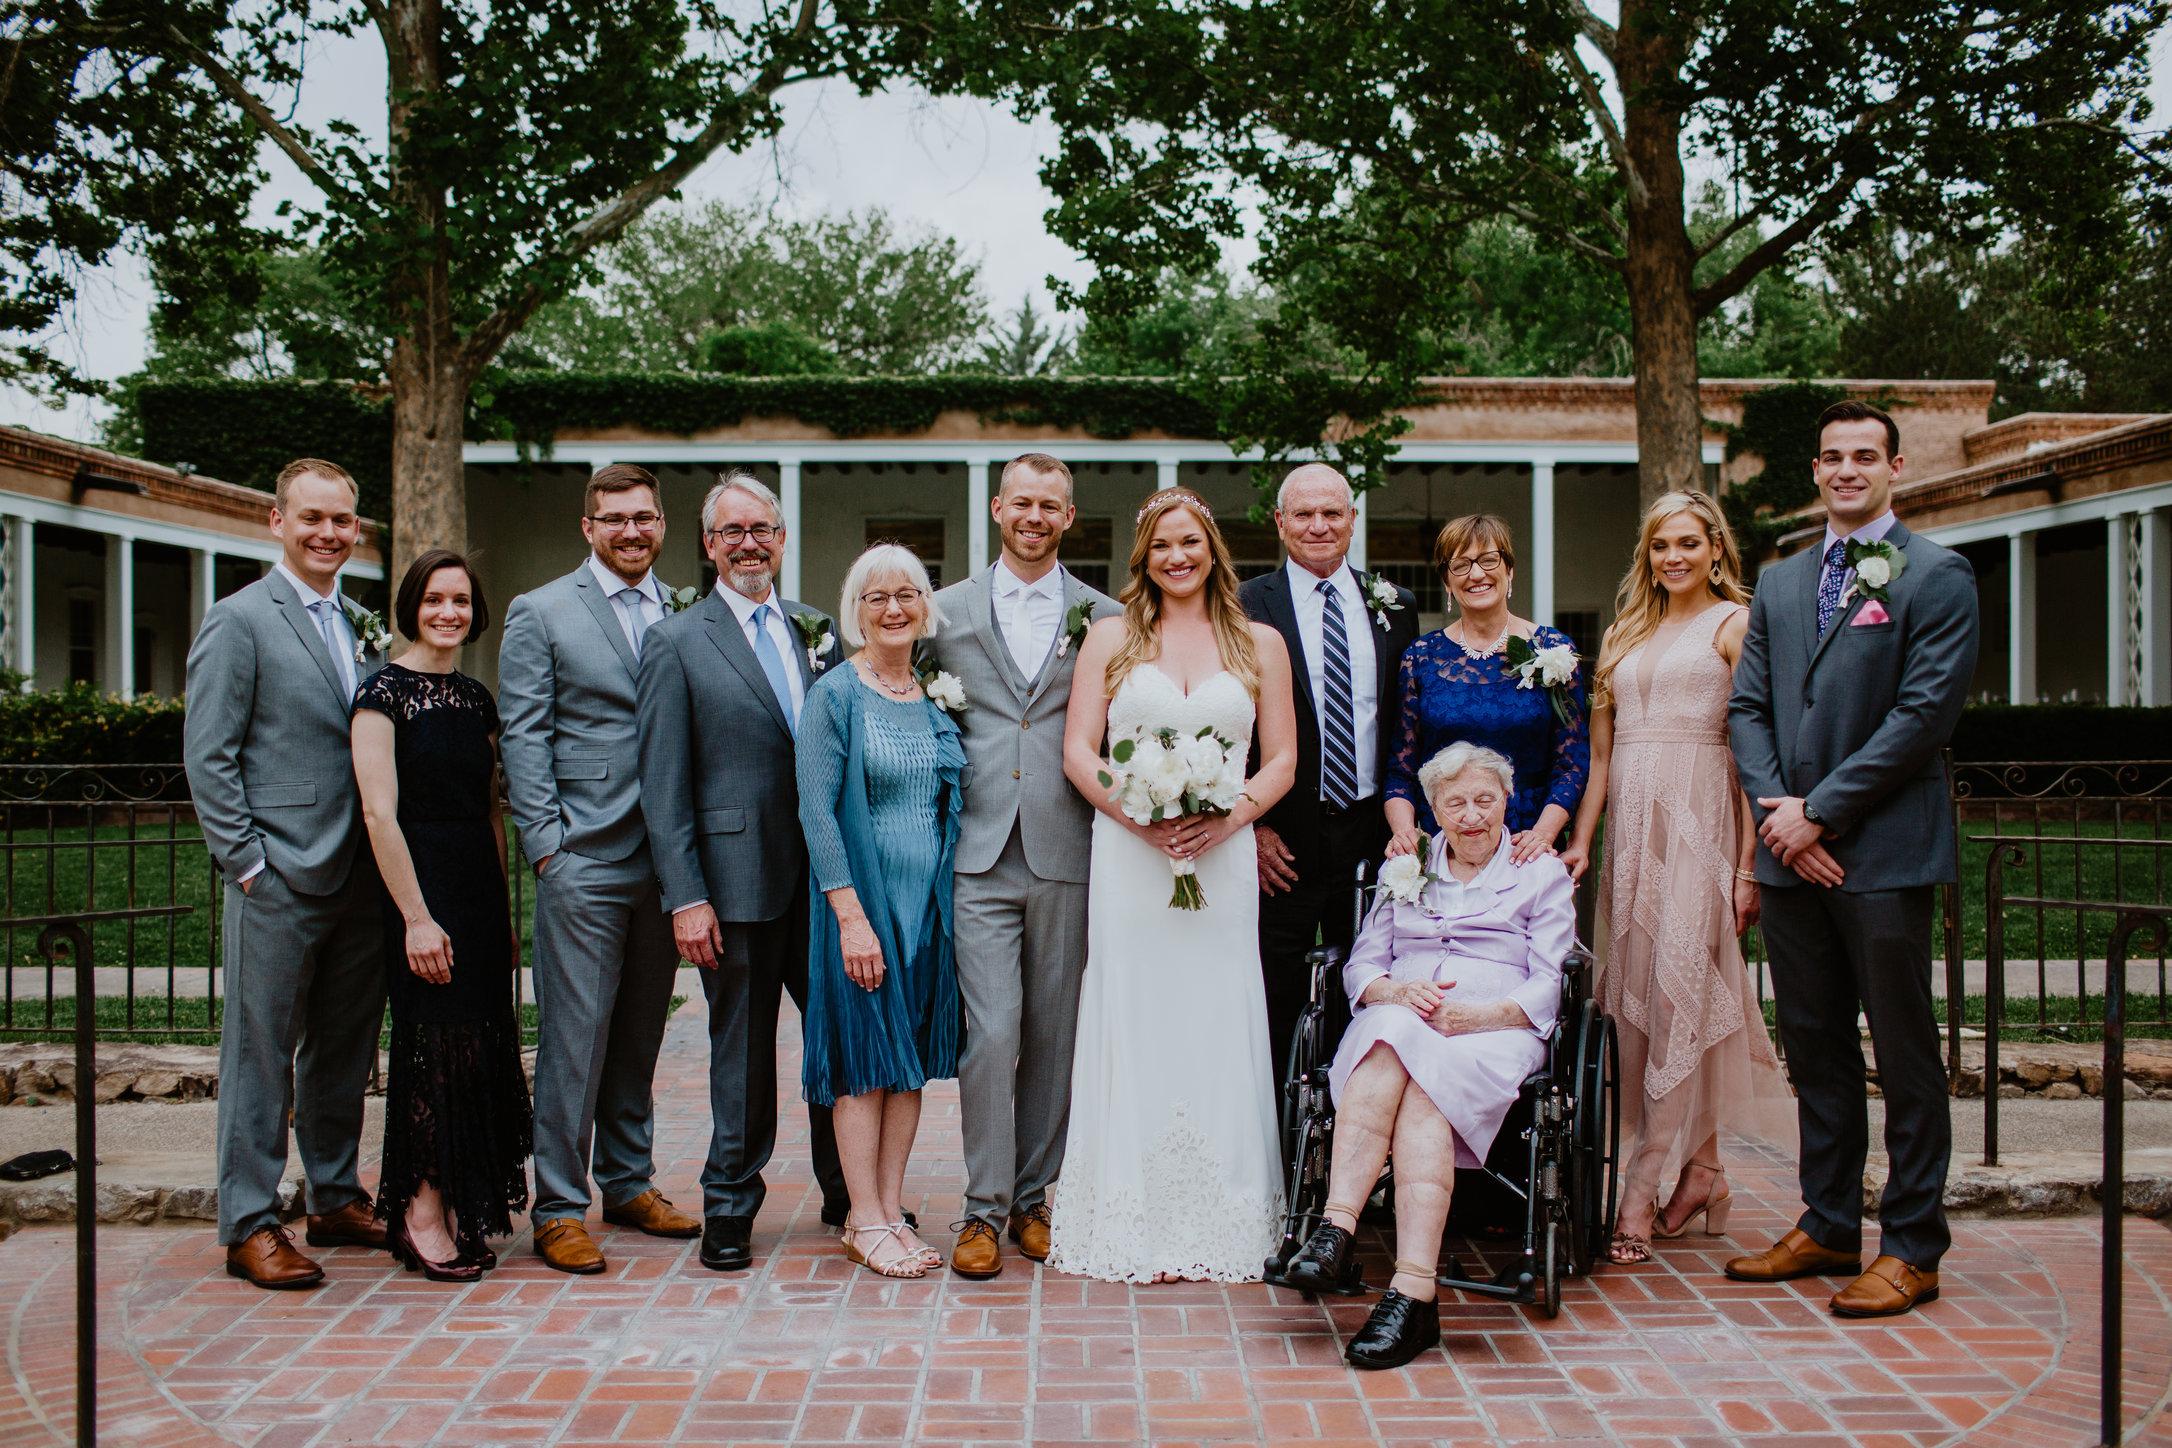 DandA-wedding-474.jpg